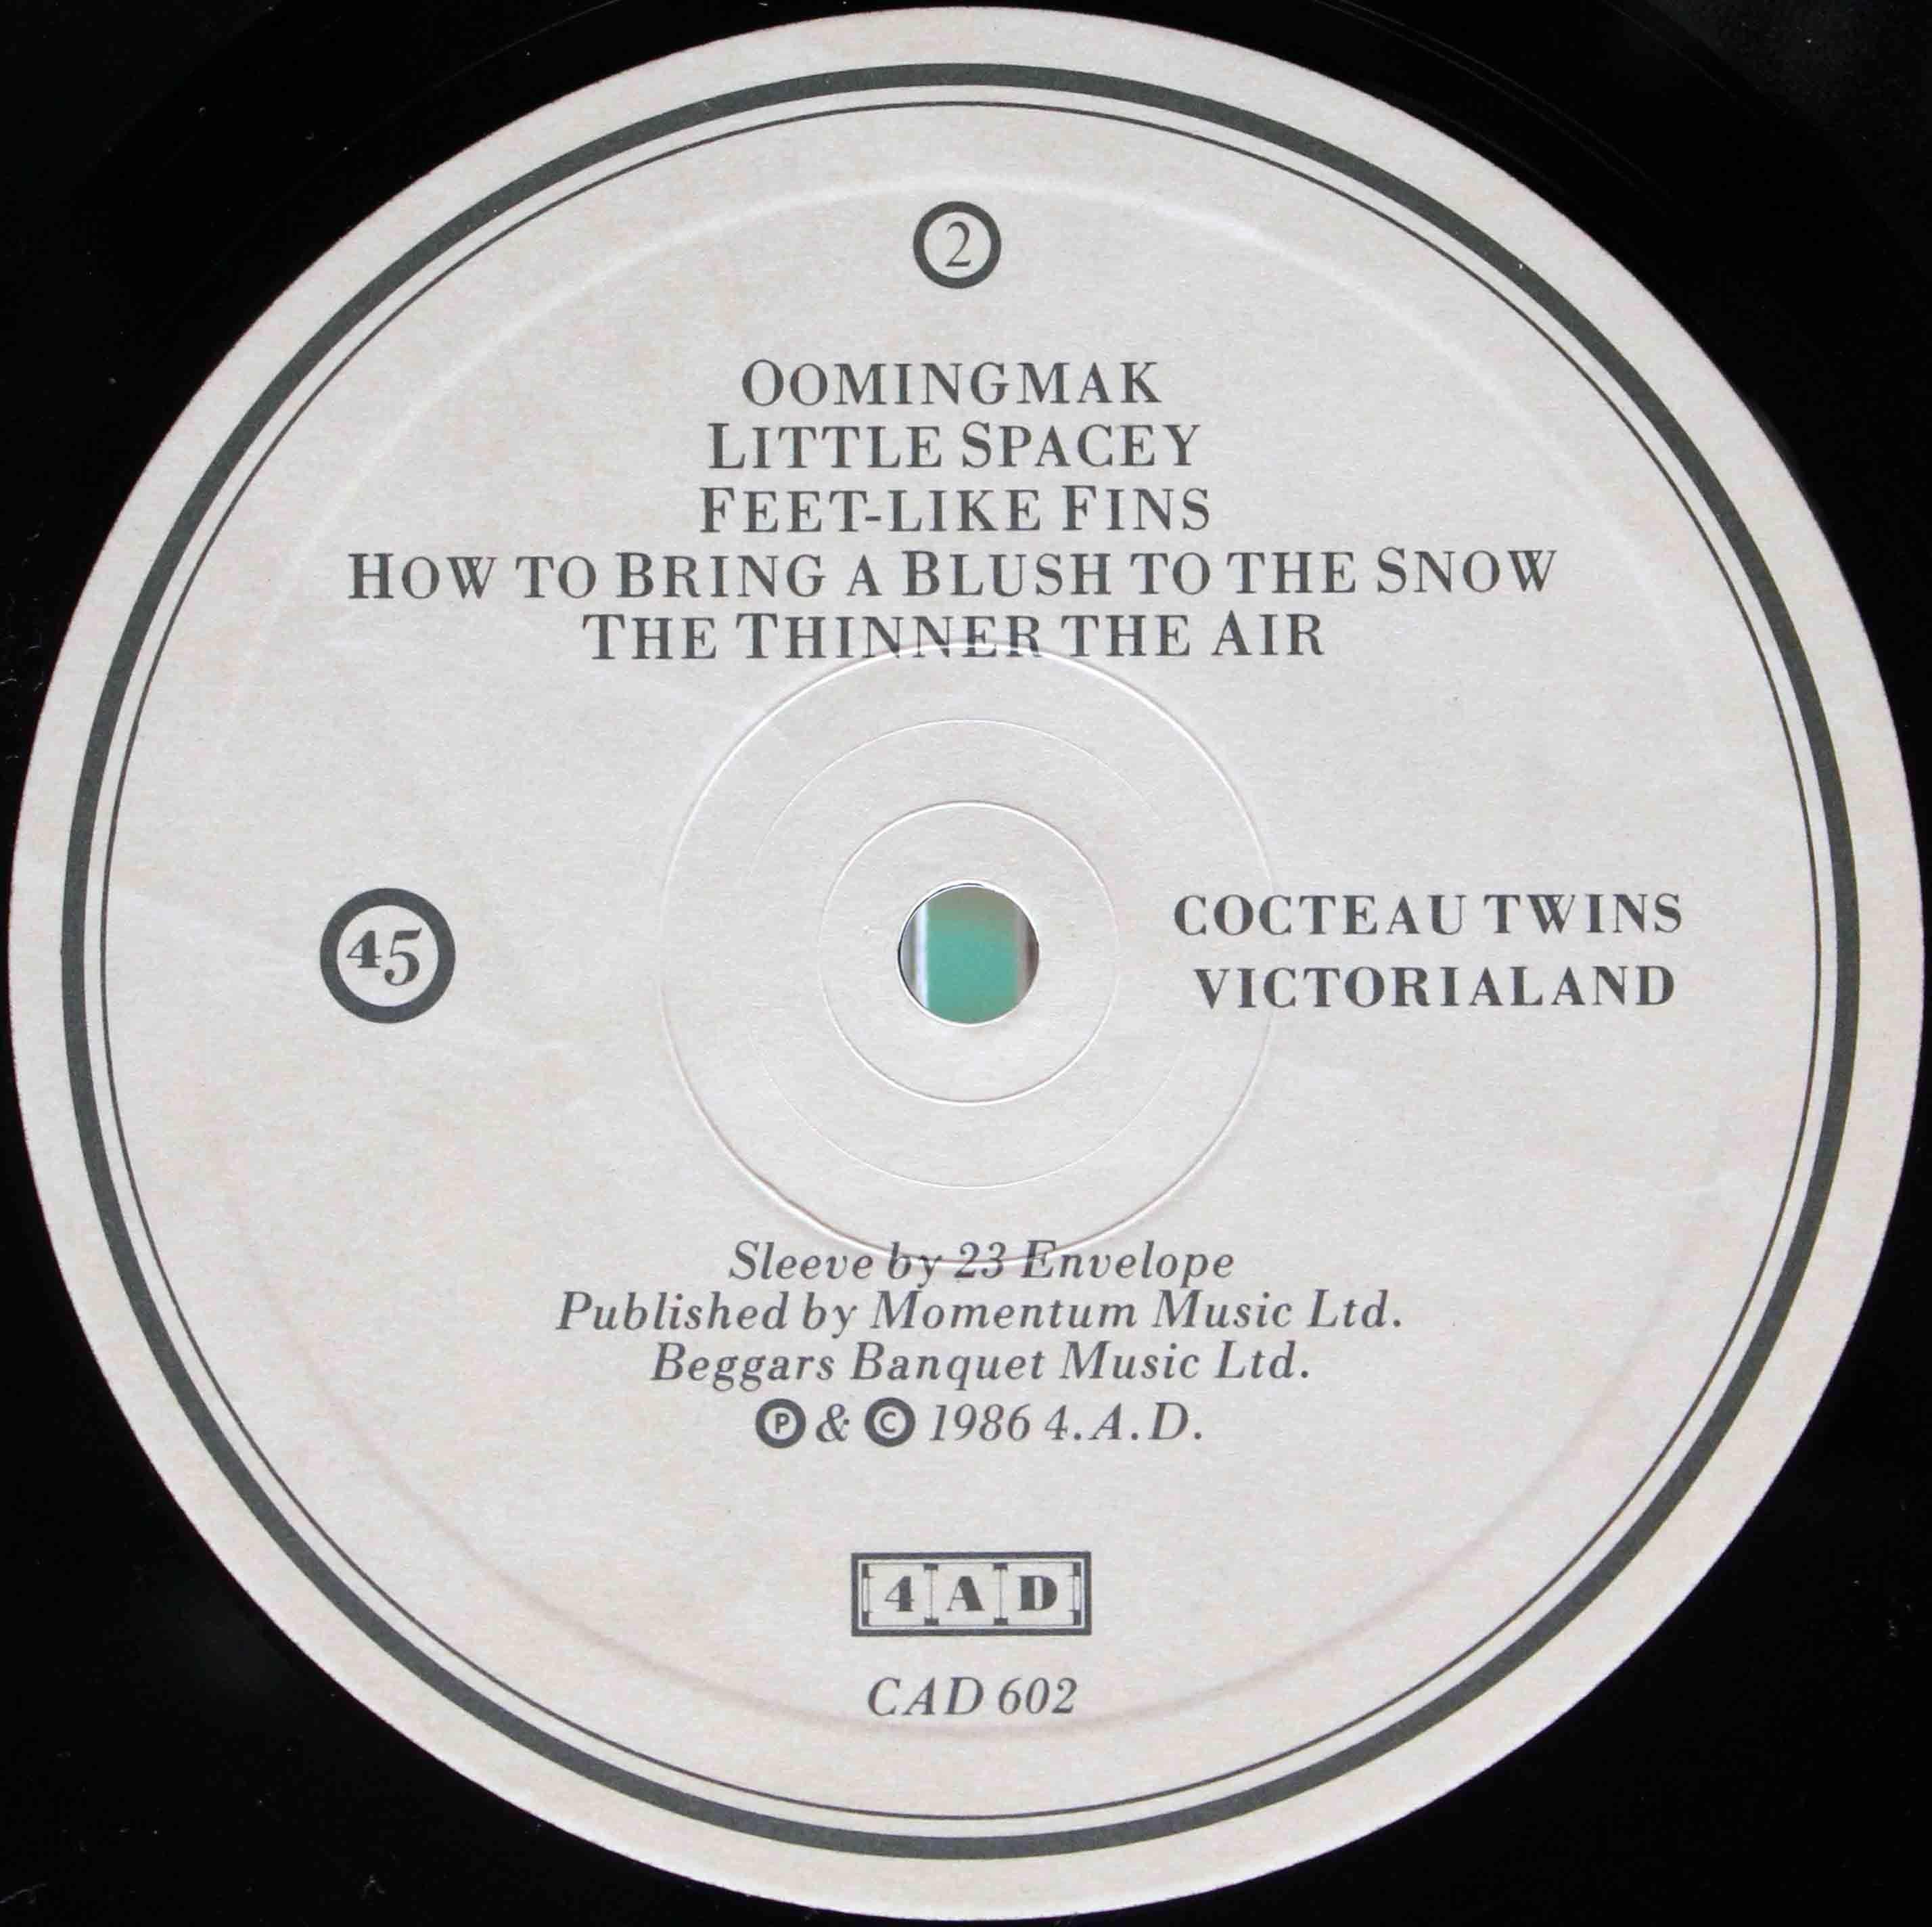 Cocteau Twins – Victorialand 05